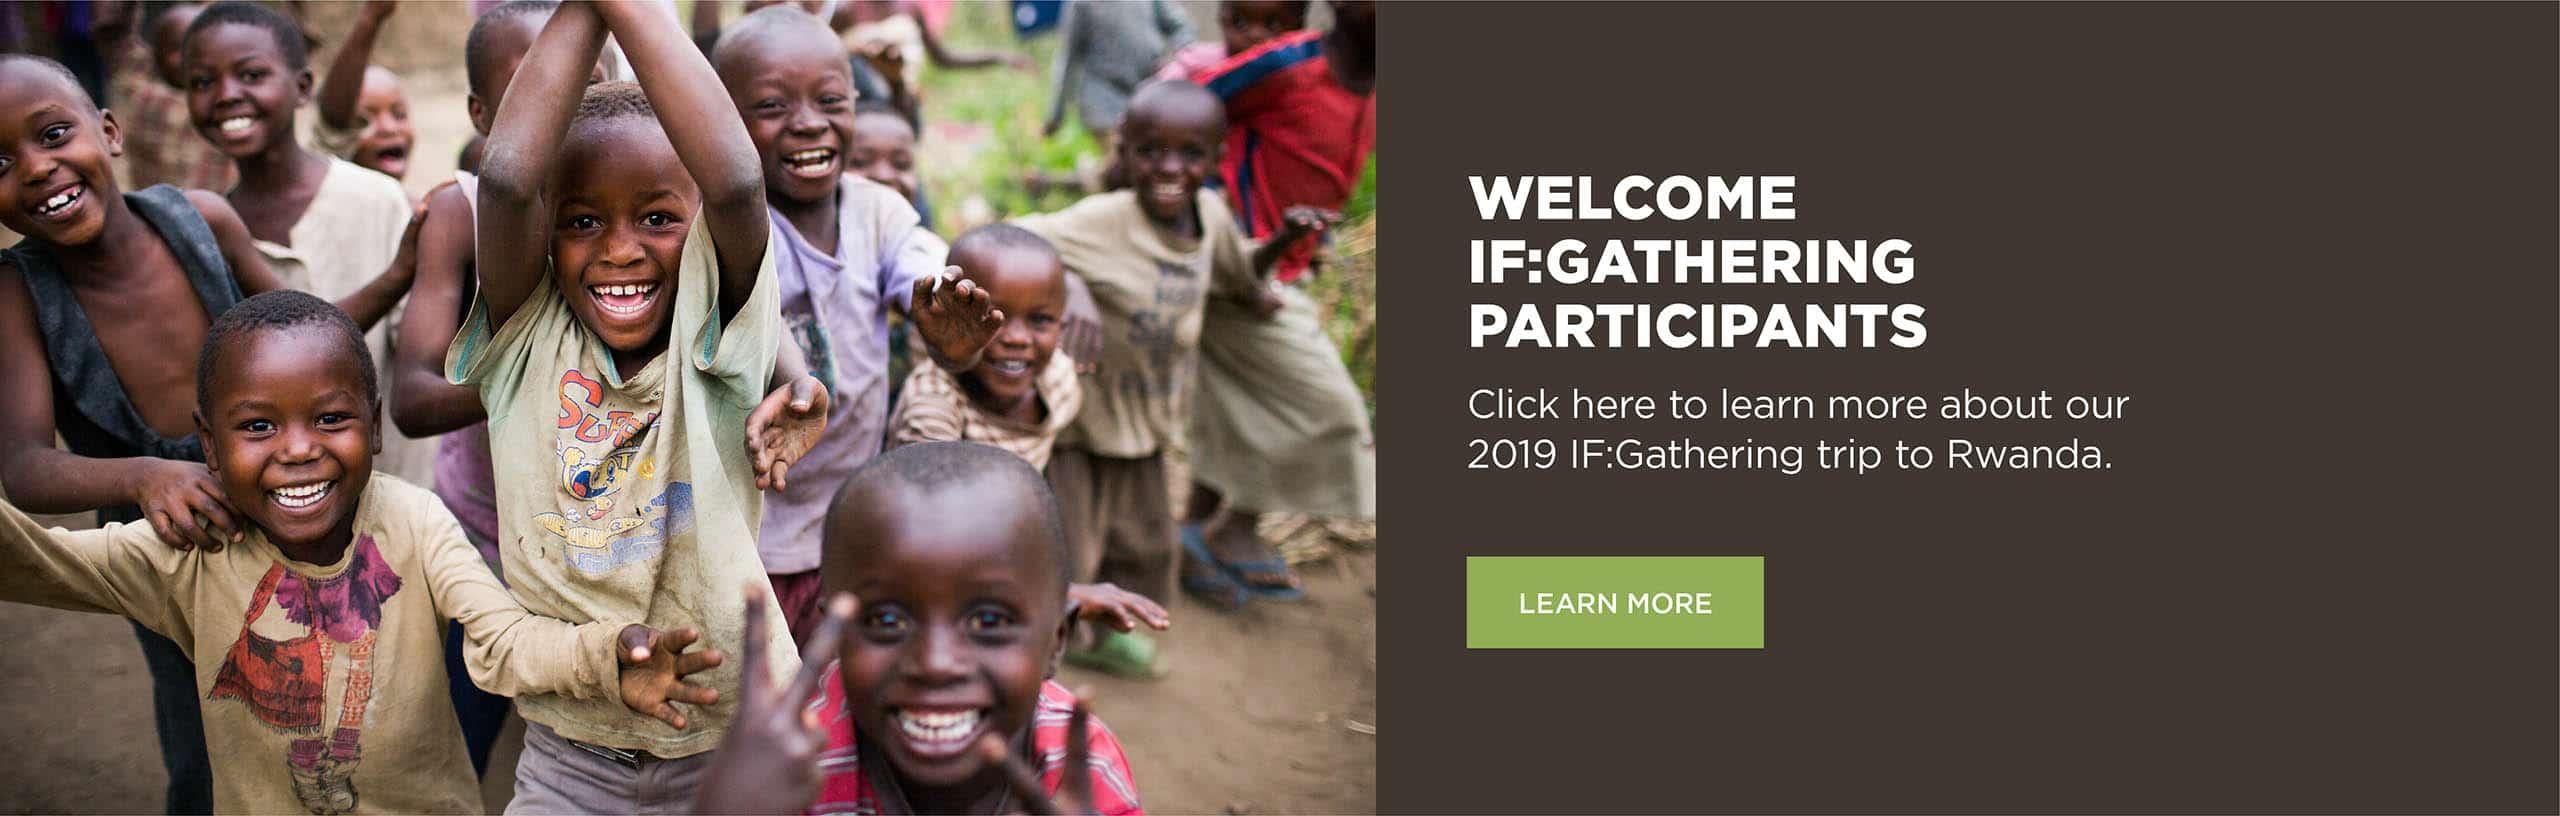 IF:Gathering Trip to Rwanda